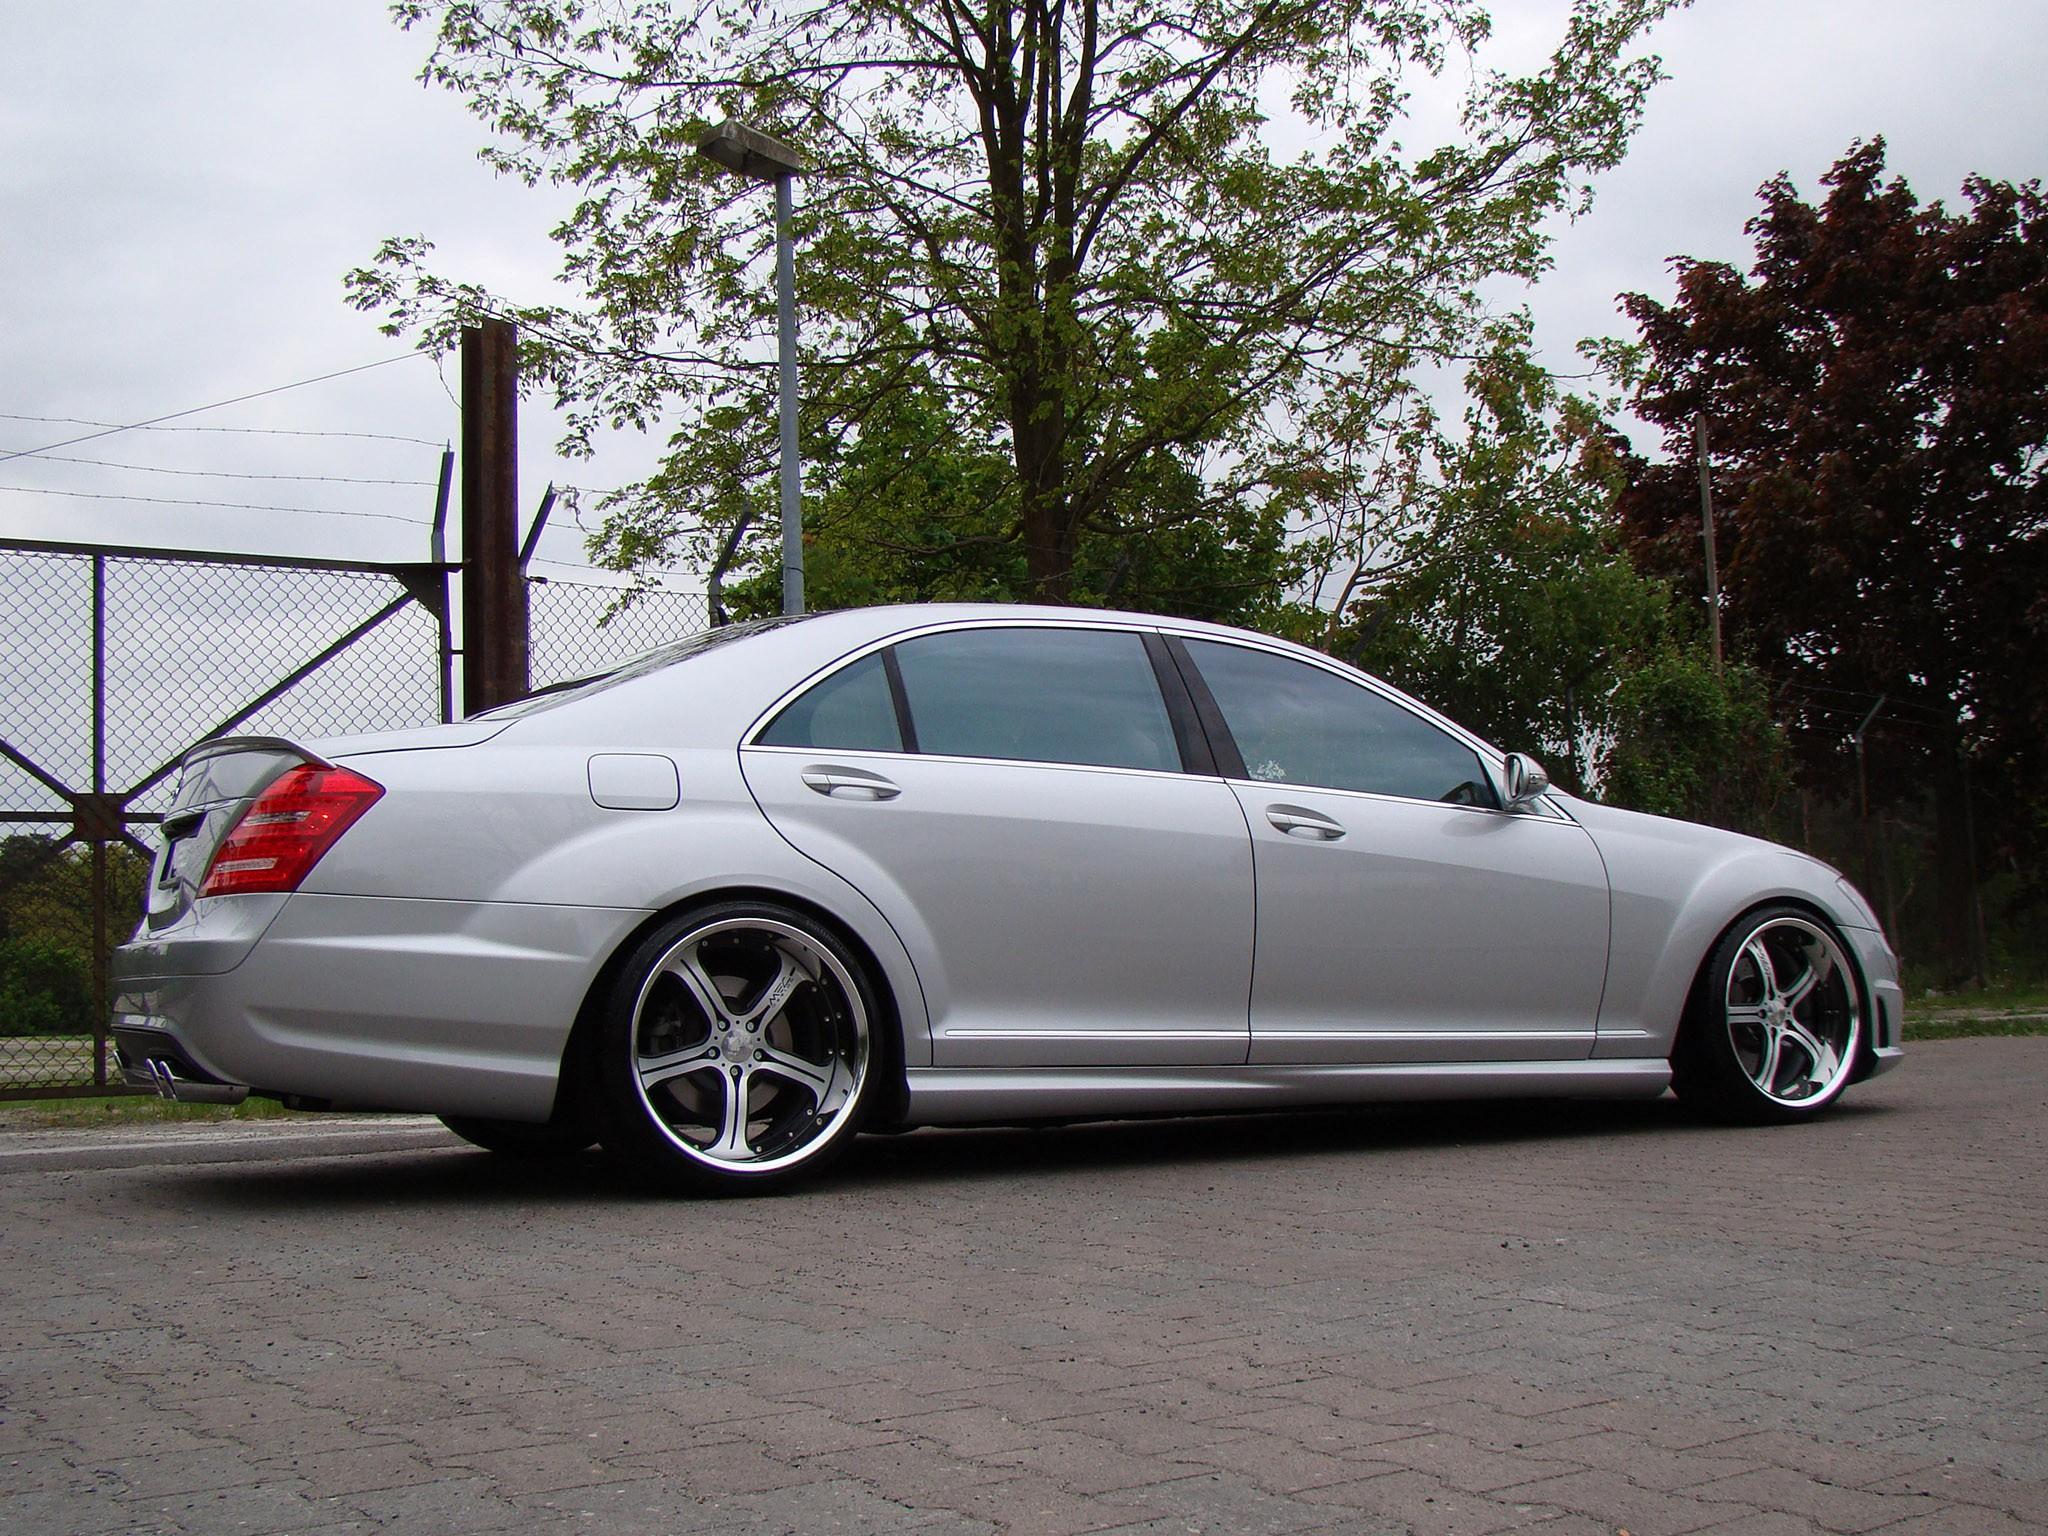 2010 Mec Design - Mercedes S Klasse S550